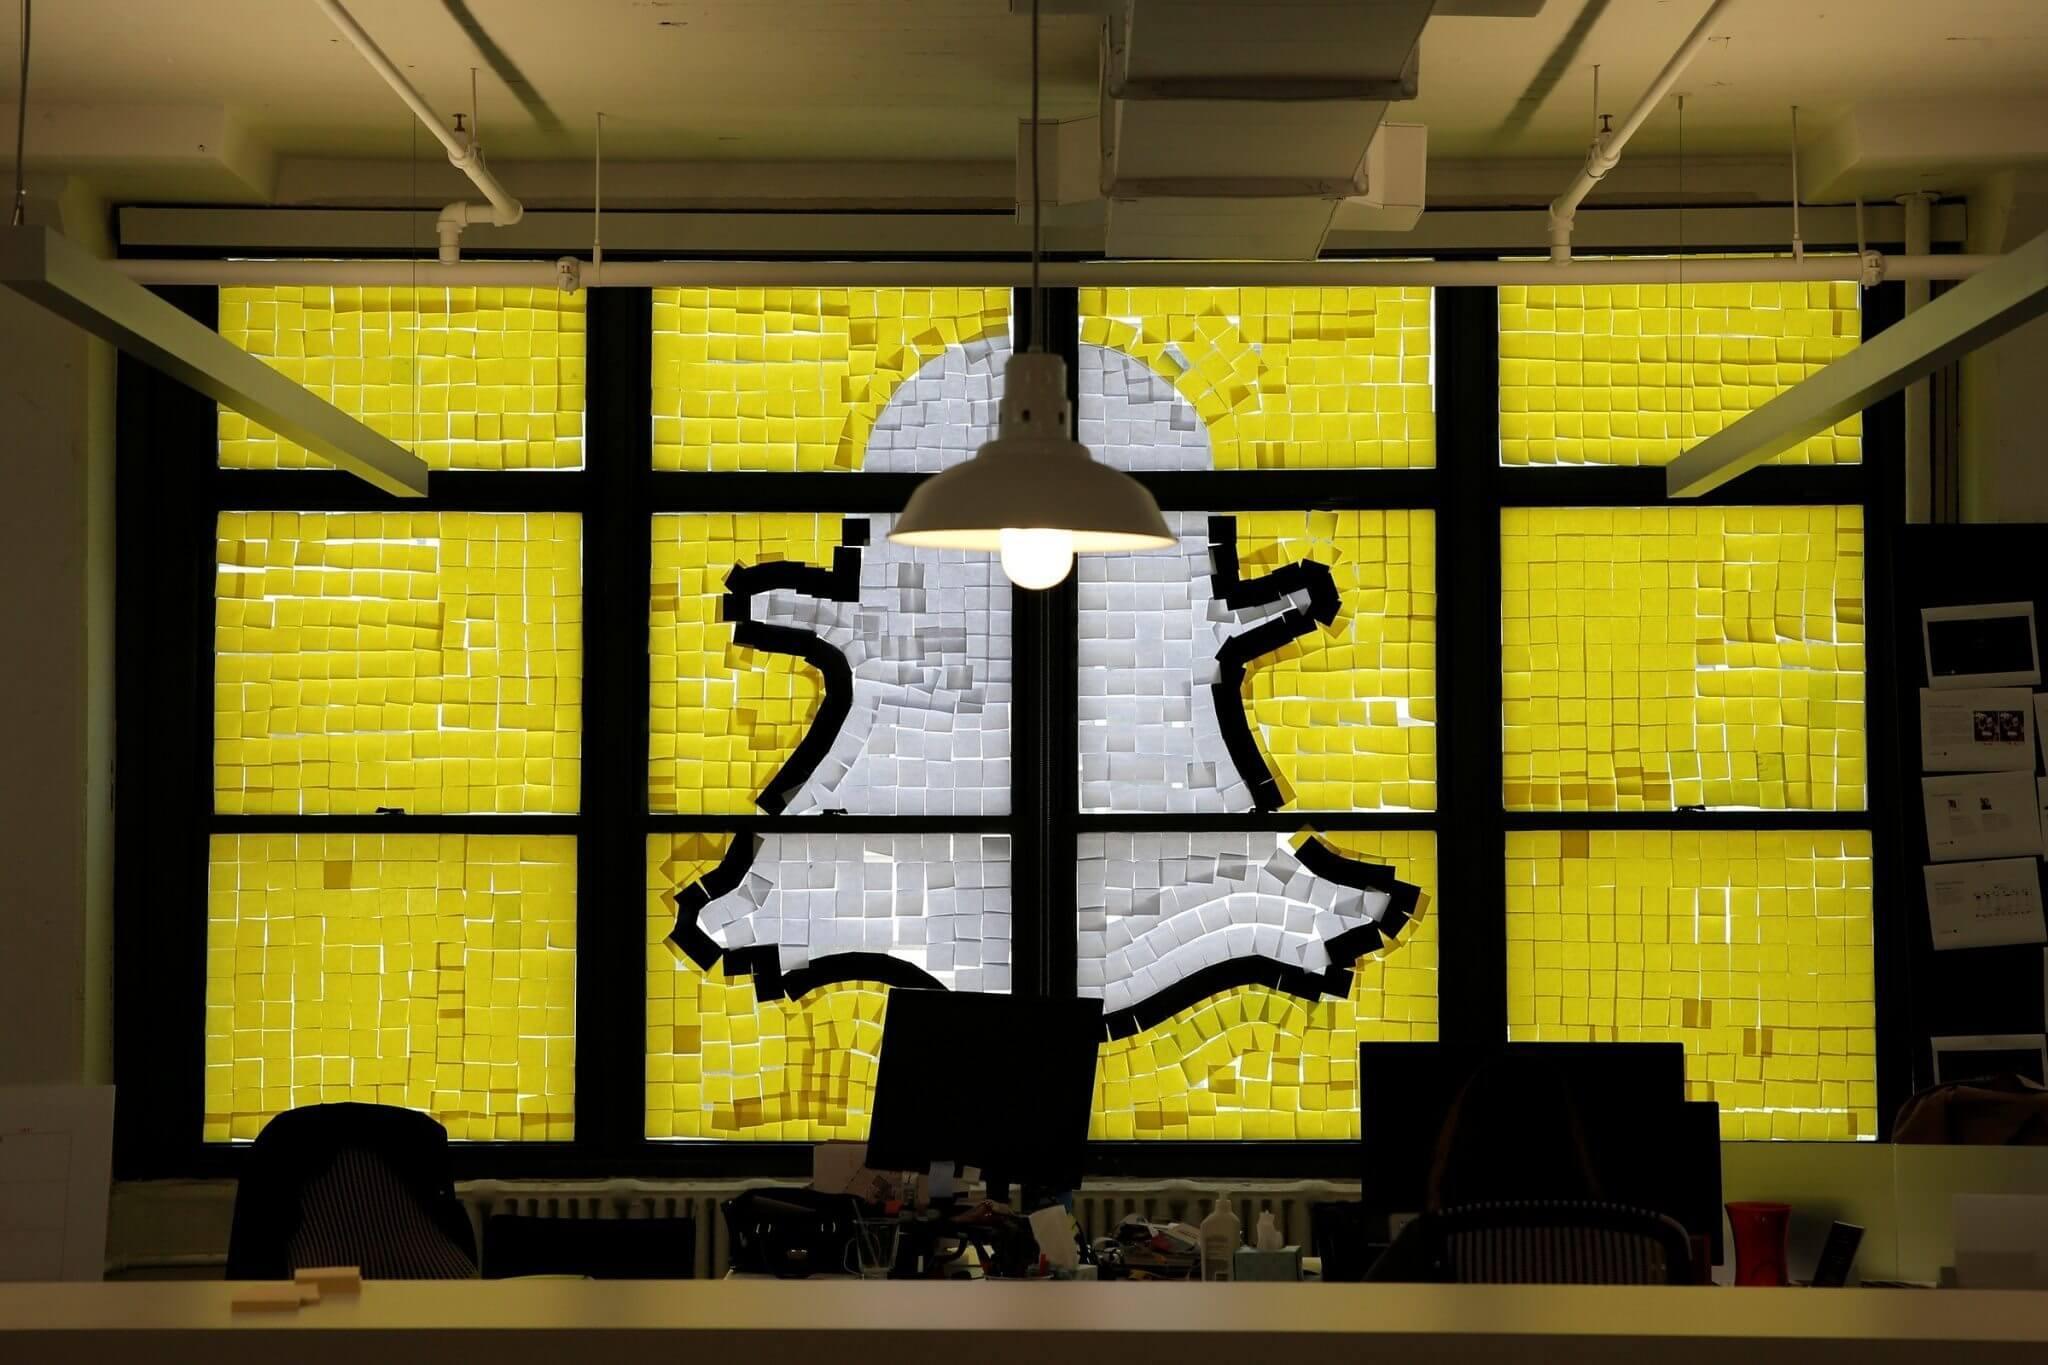 Snapchat lawsuit capa